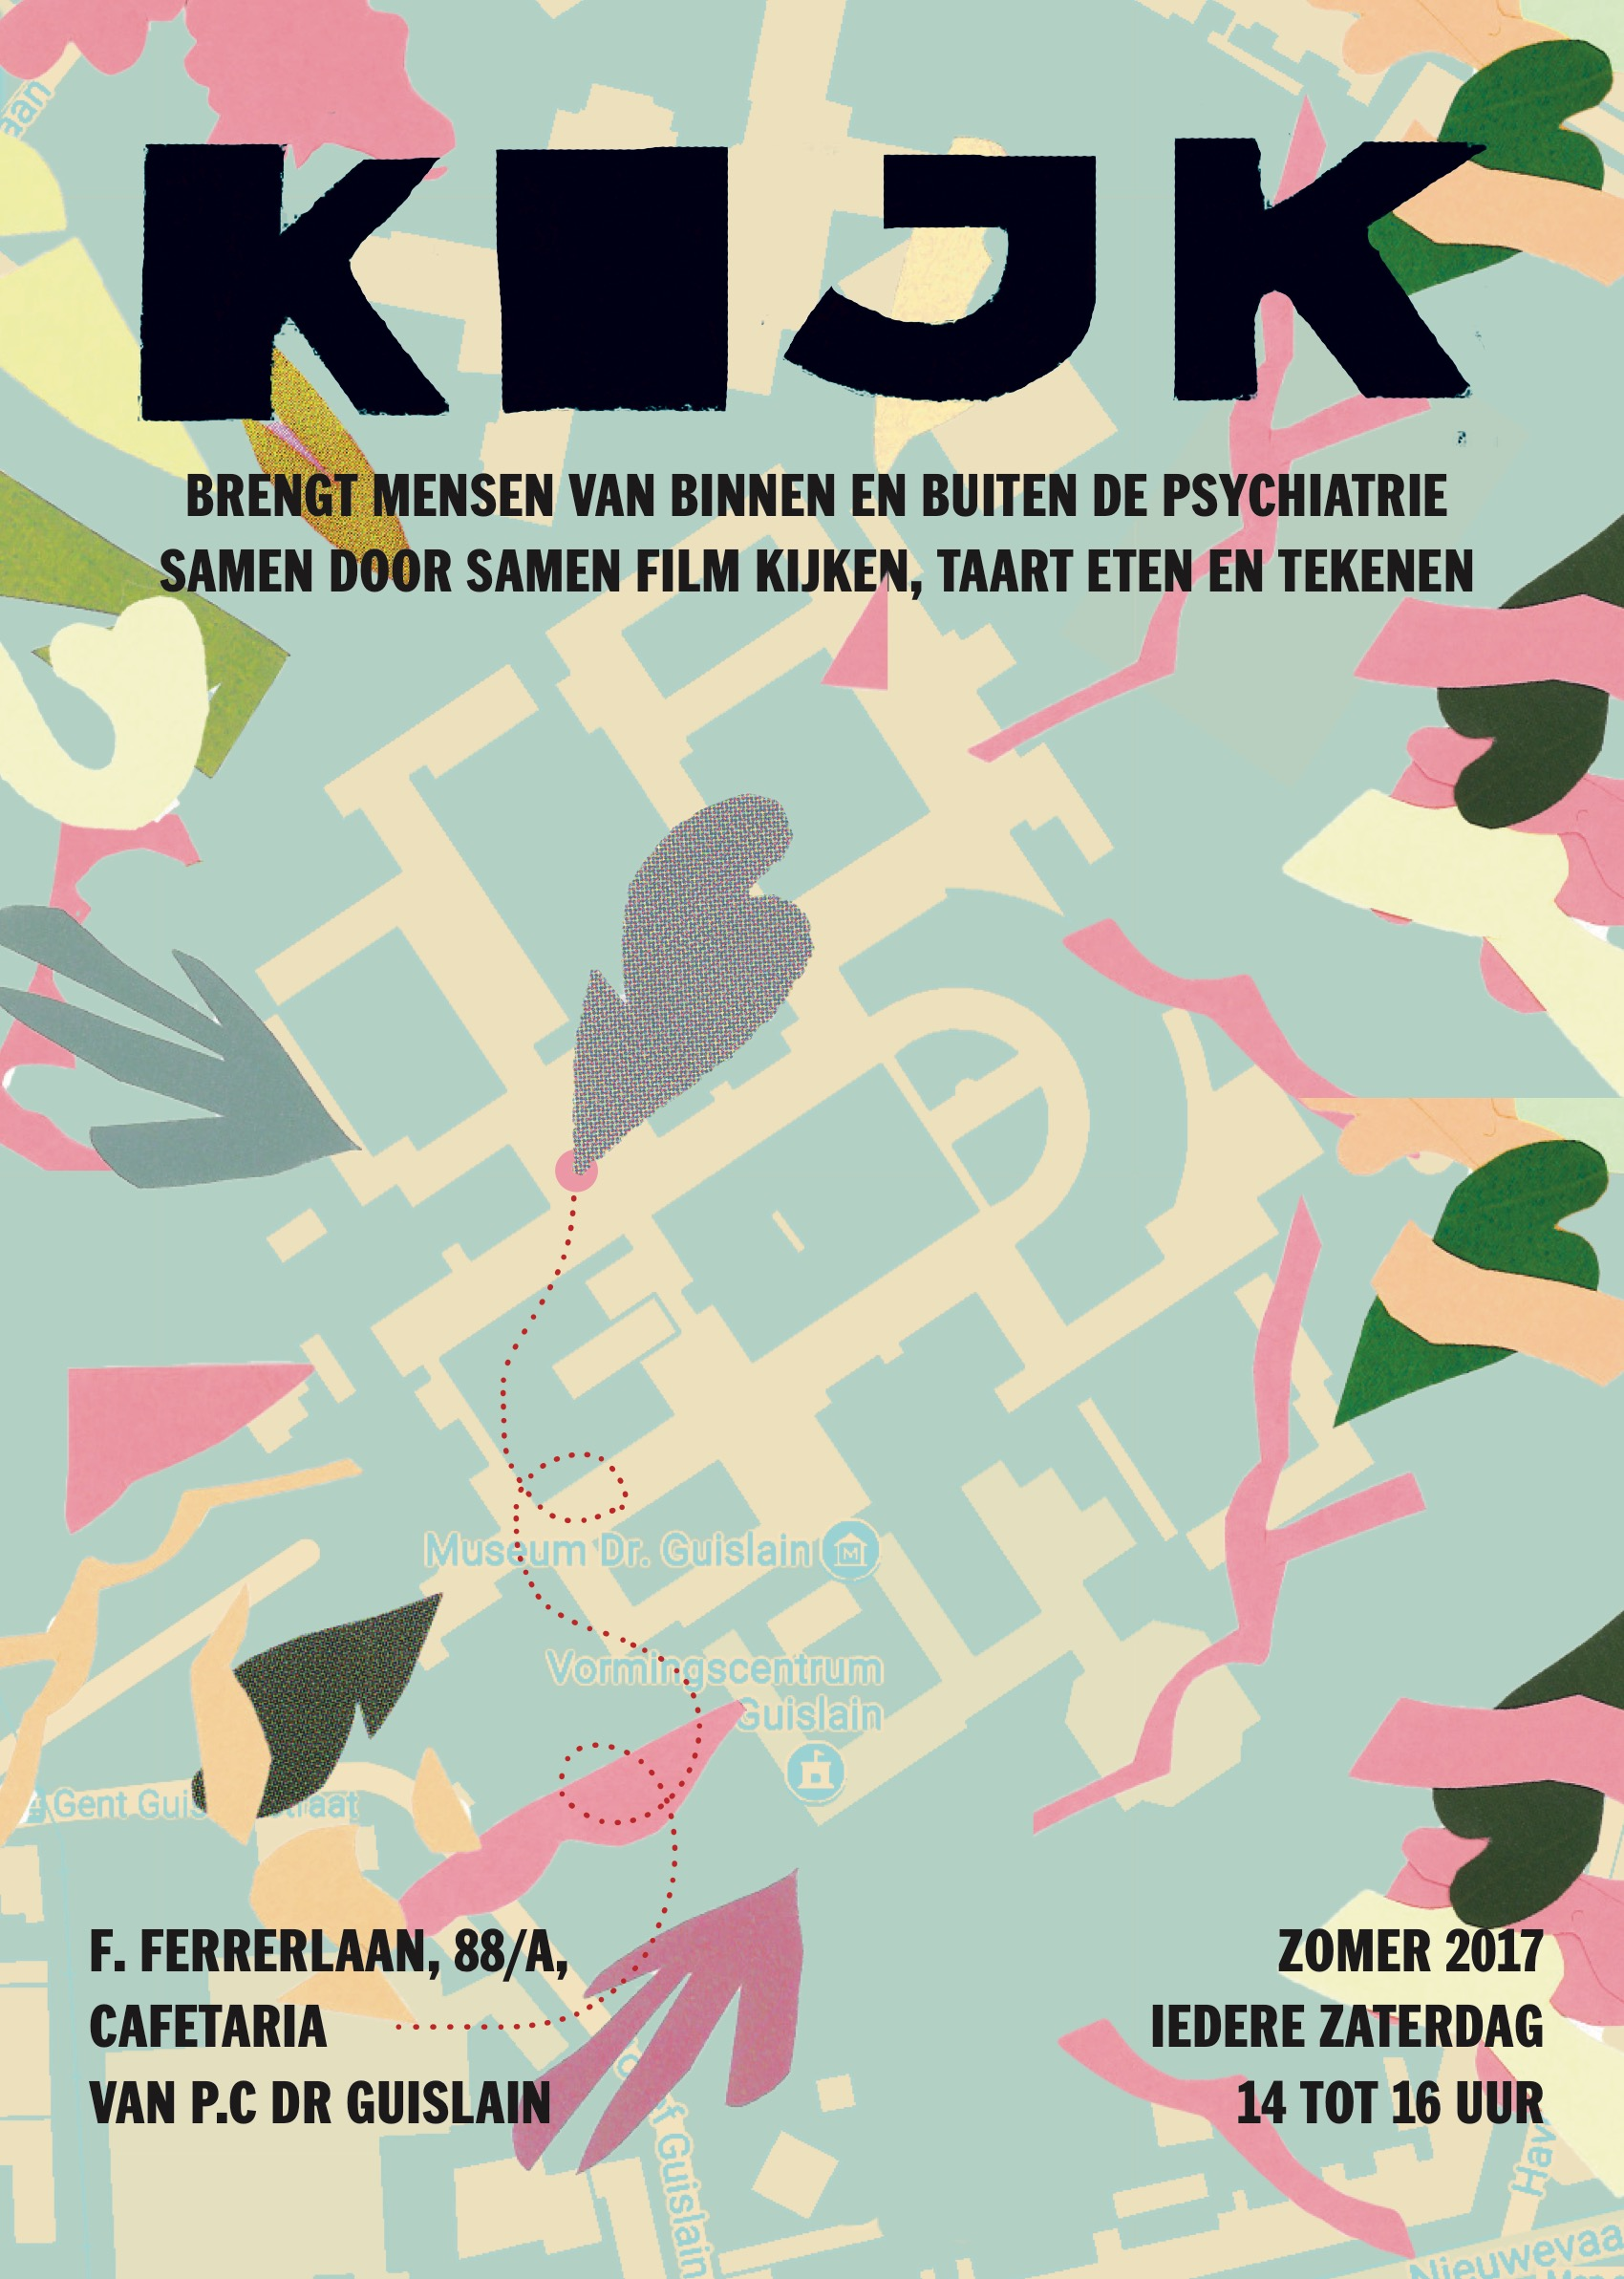 poster by Fru Pintér